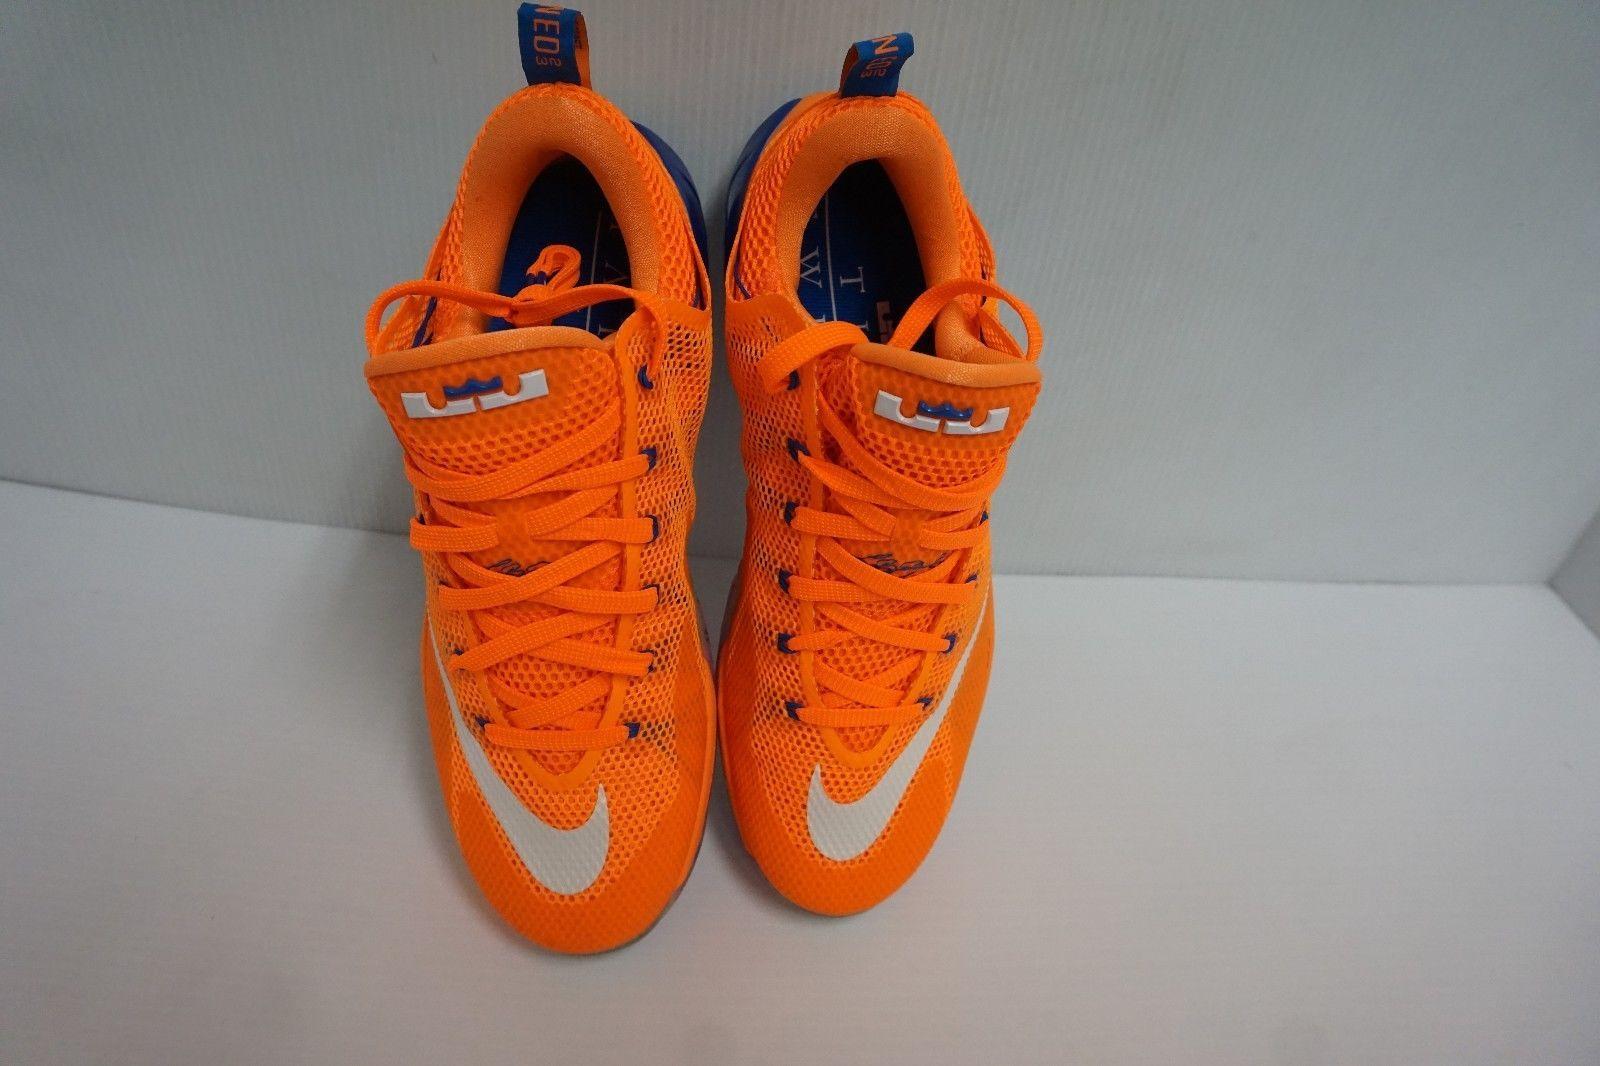 brand new 224db 39ecc Nike Lebron xii low basketball shoes bright citrus size 11.5 us